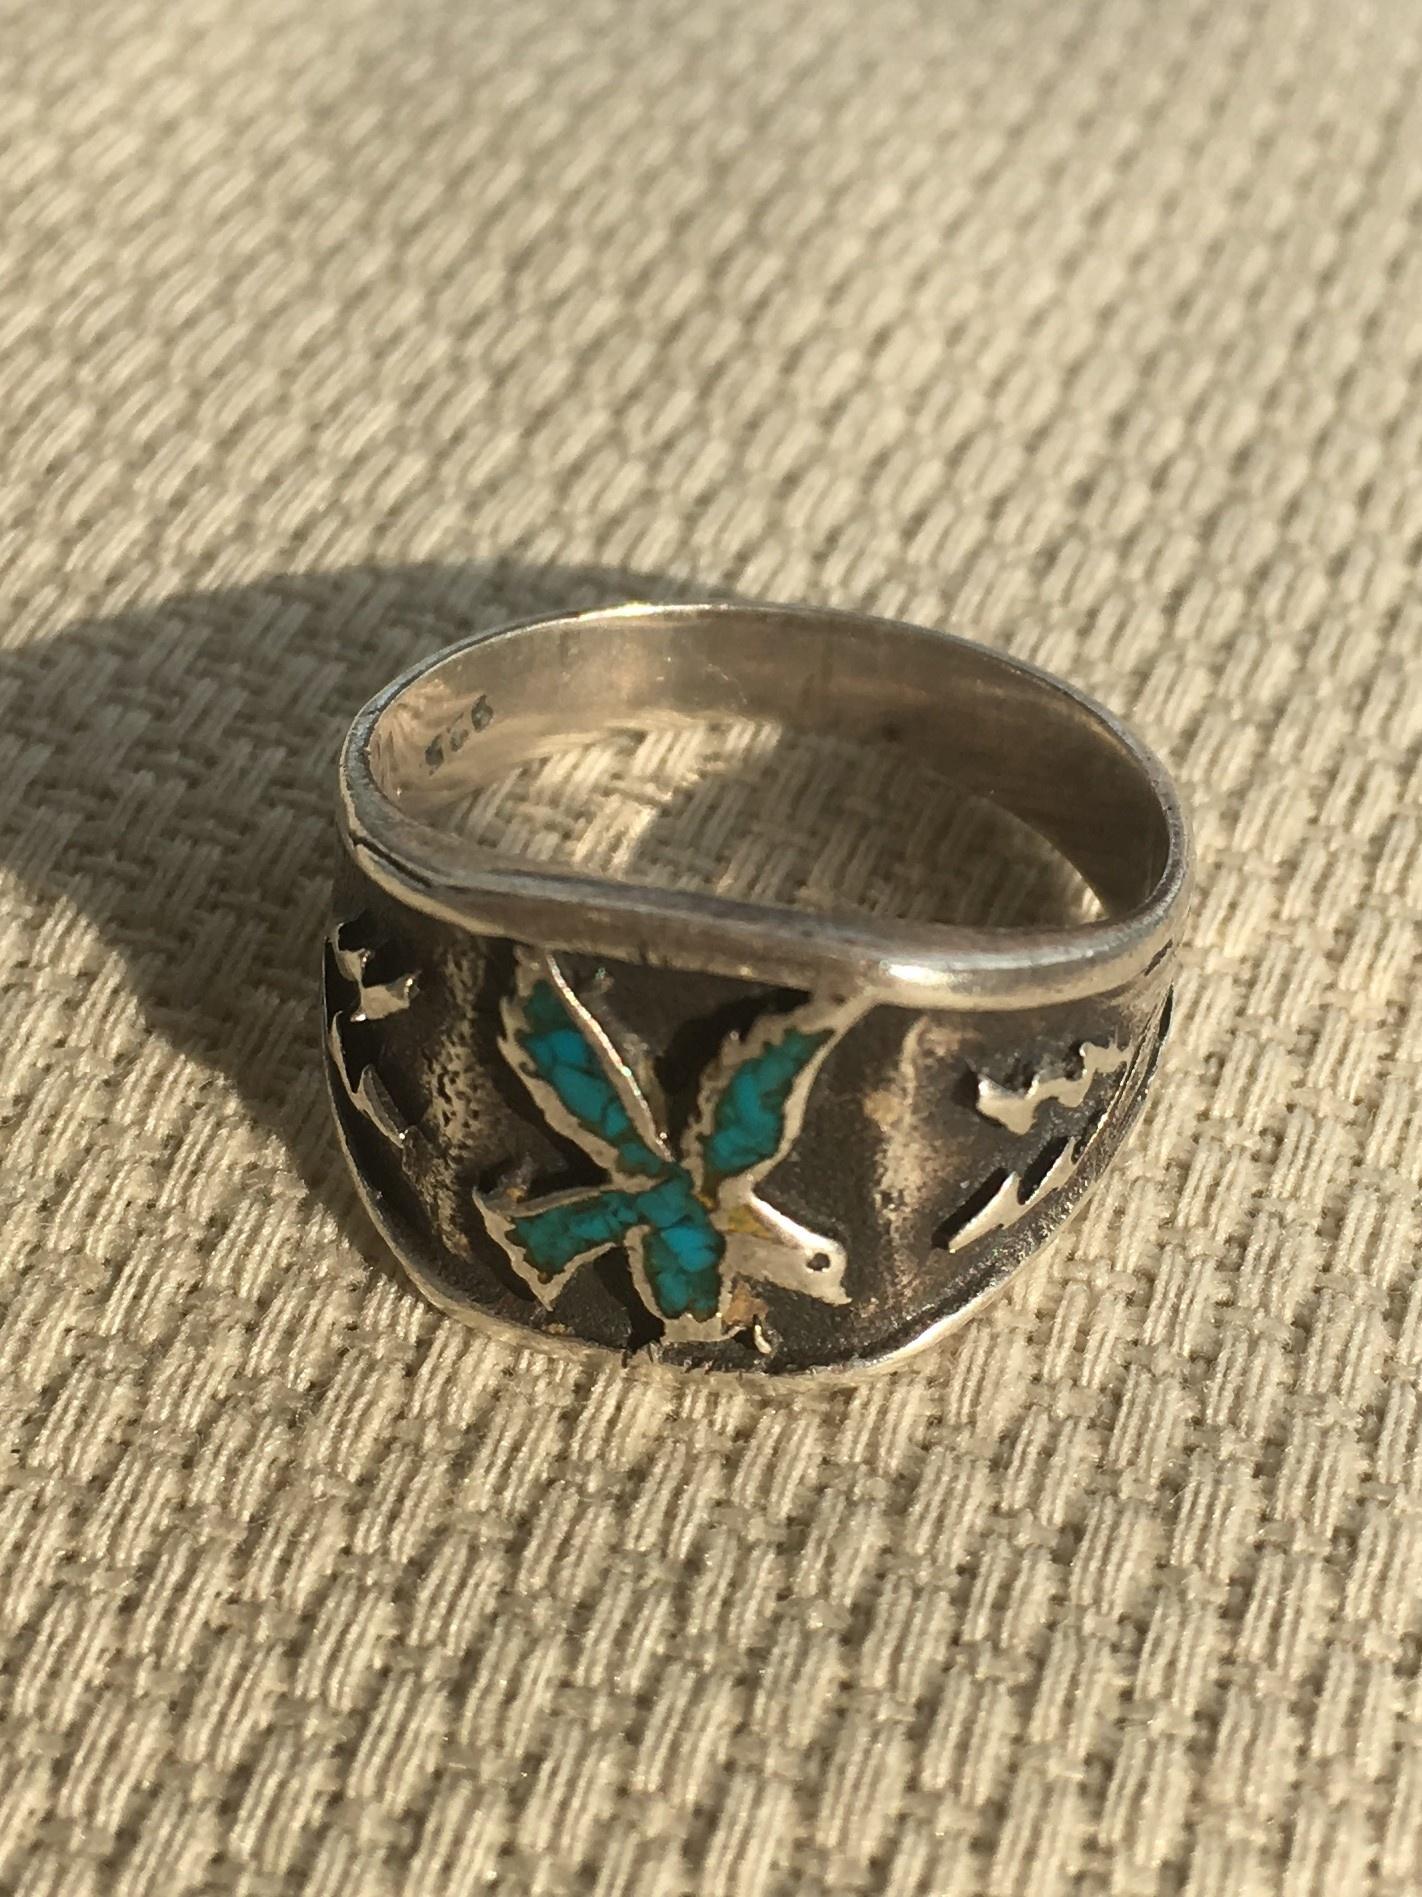 Harley Davidson Jewelry Rings : harley, davidson, jewelry, rings, Mystery, Harley, Davidson, Collectors, Weekly